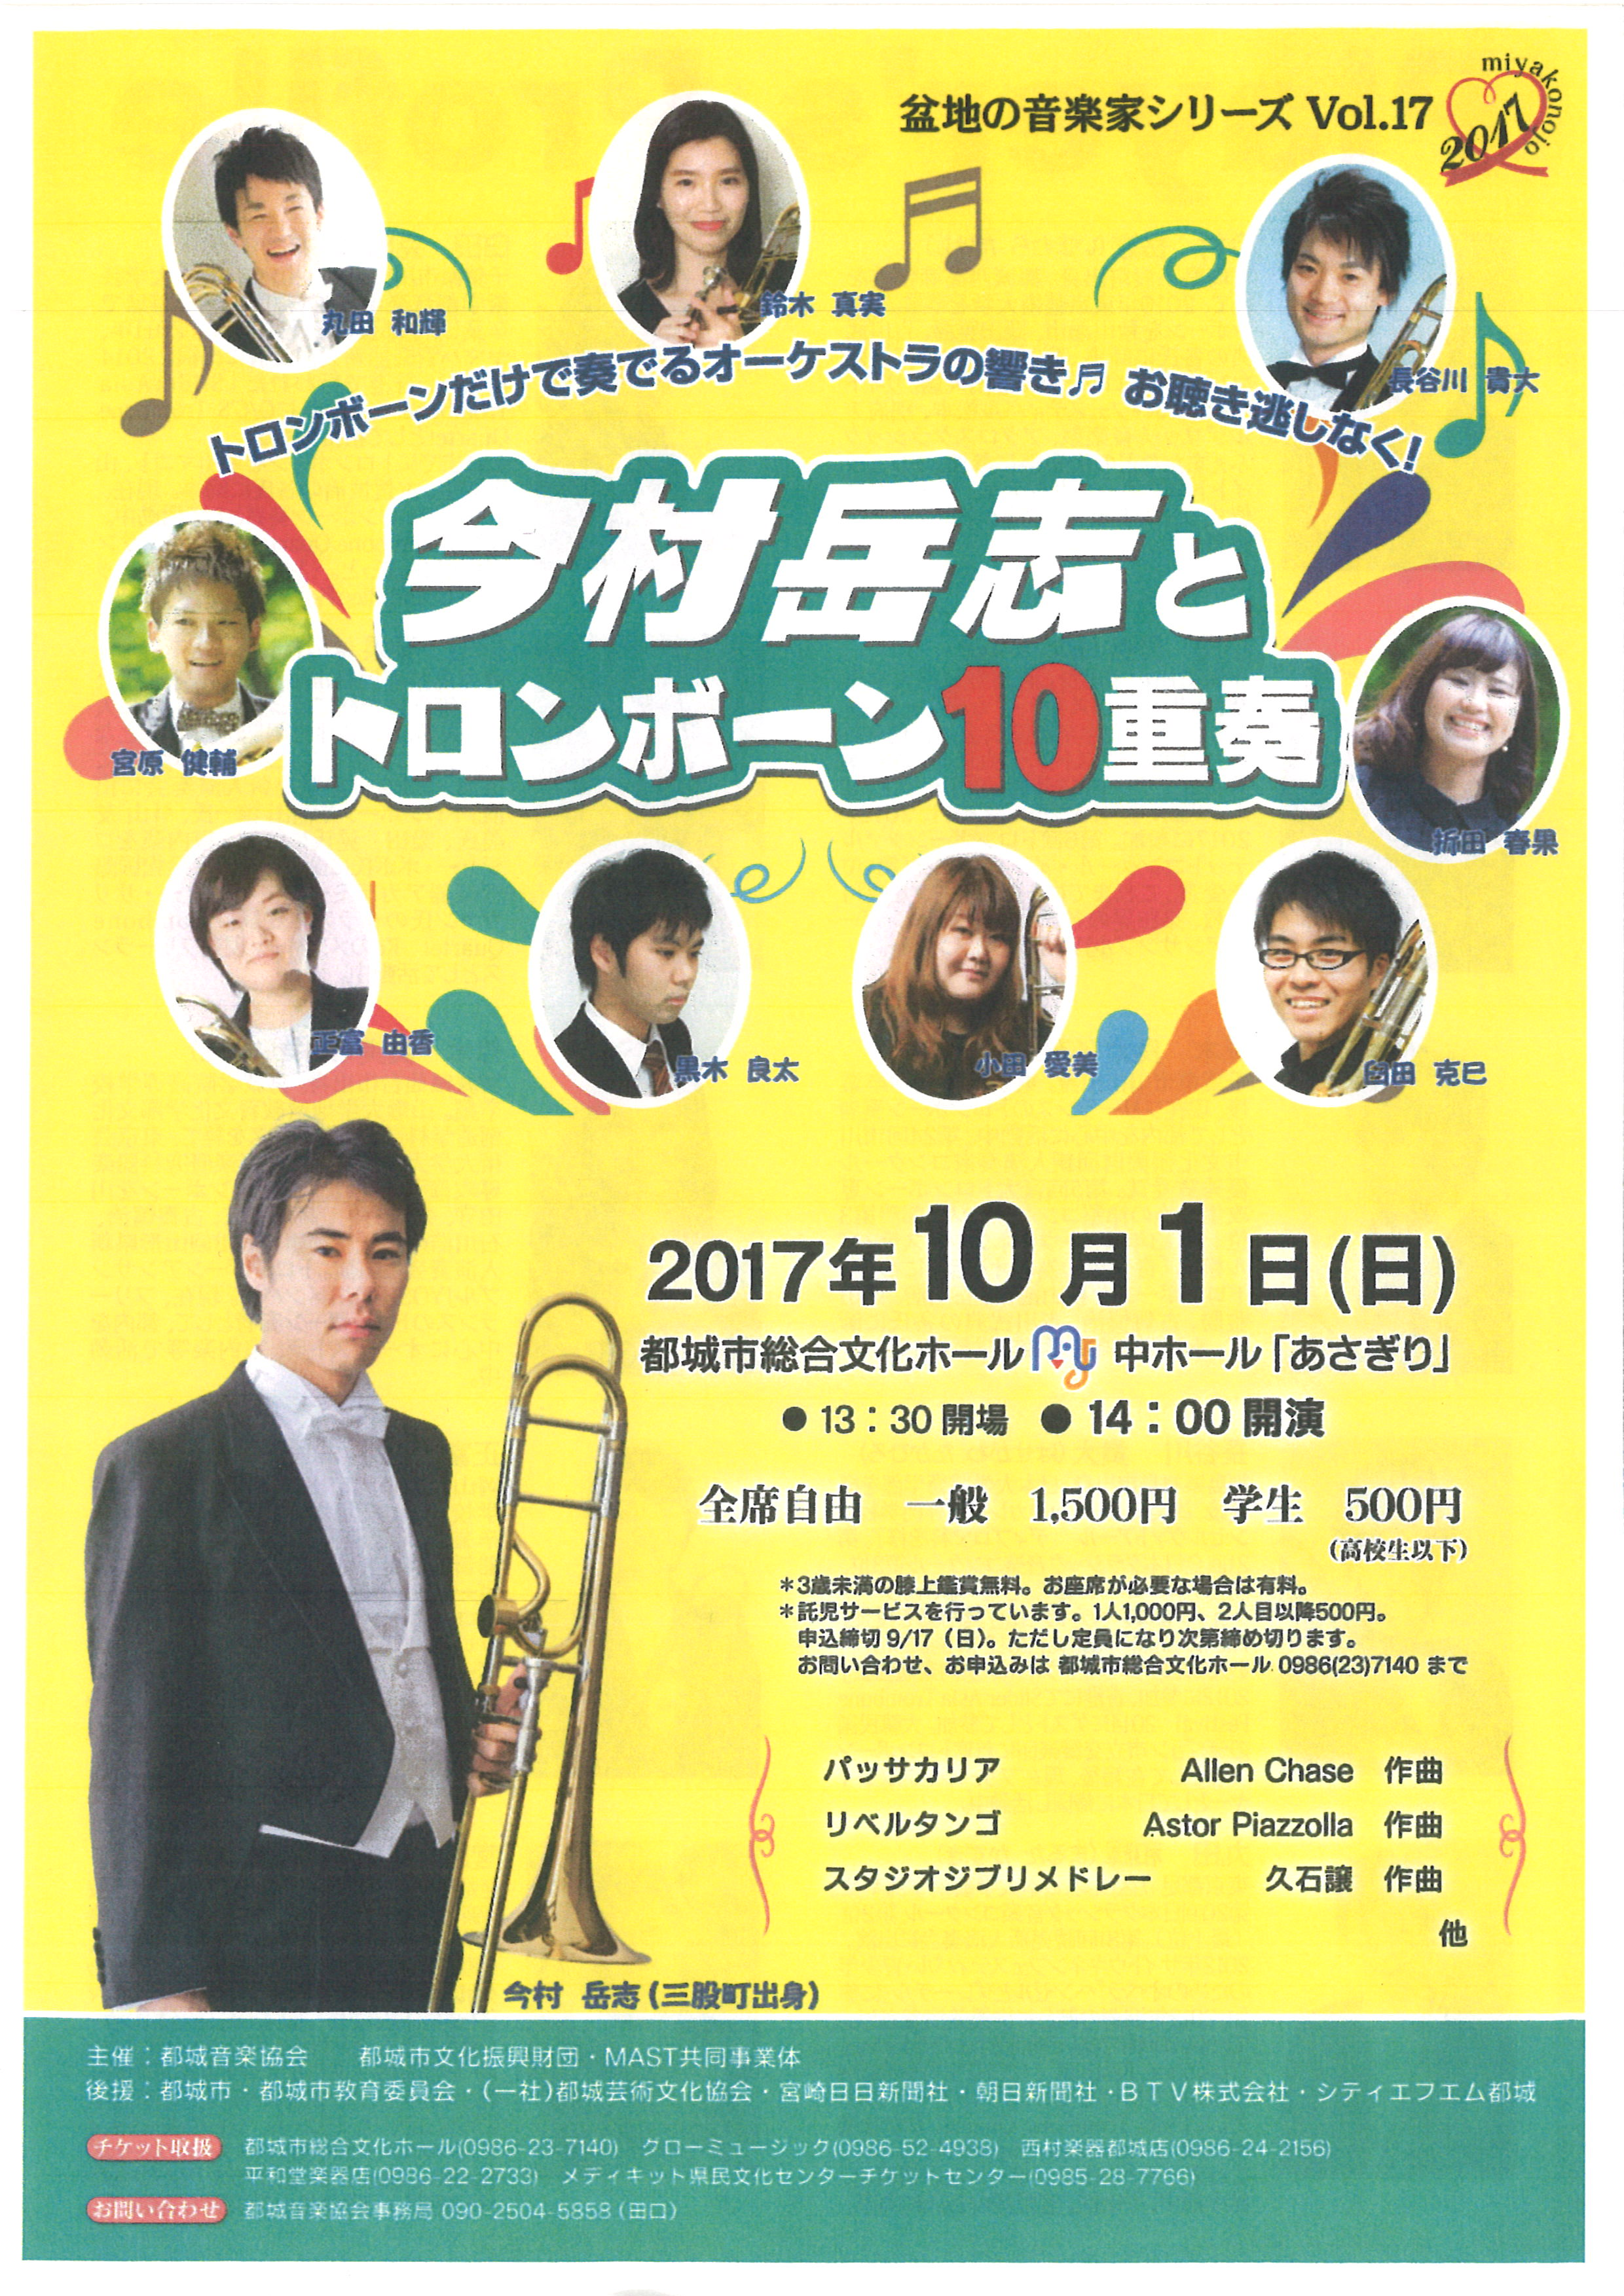 http://mj-hall.jp/performance/291001omote.jpg